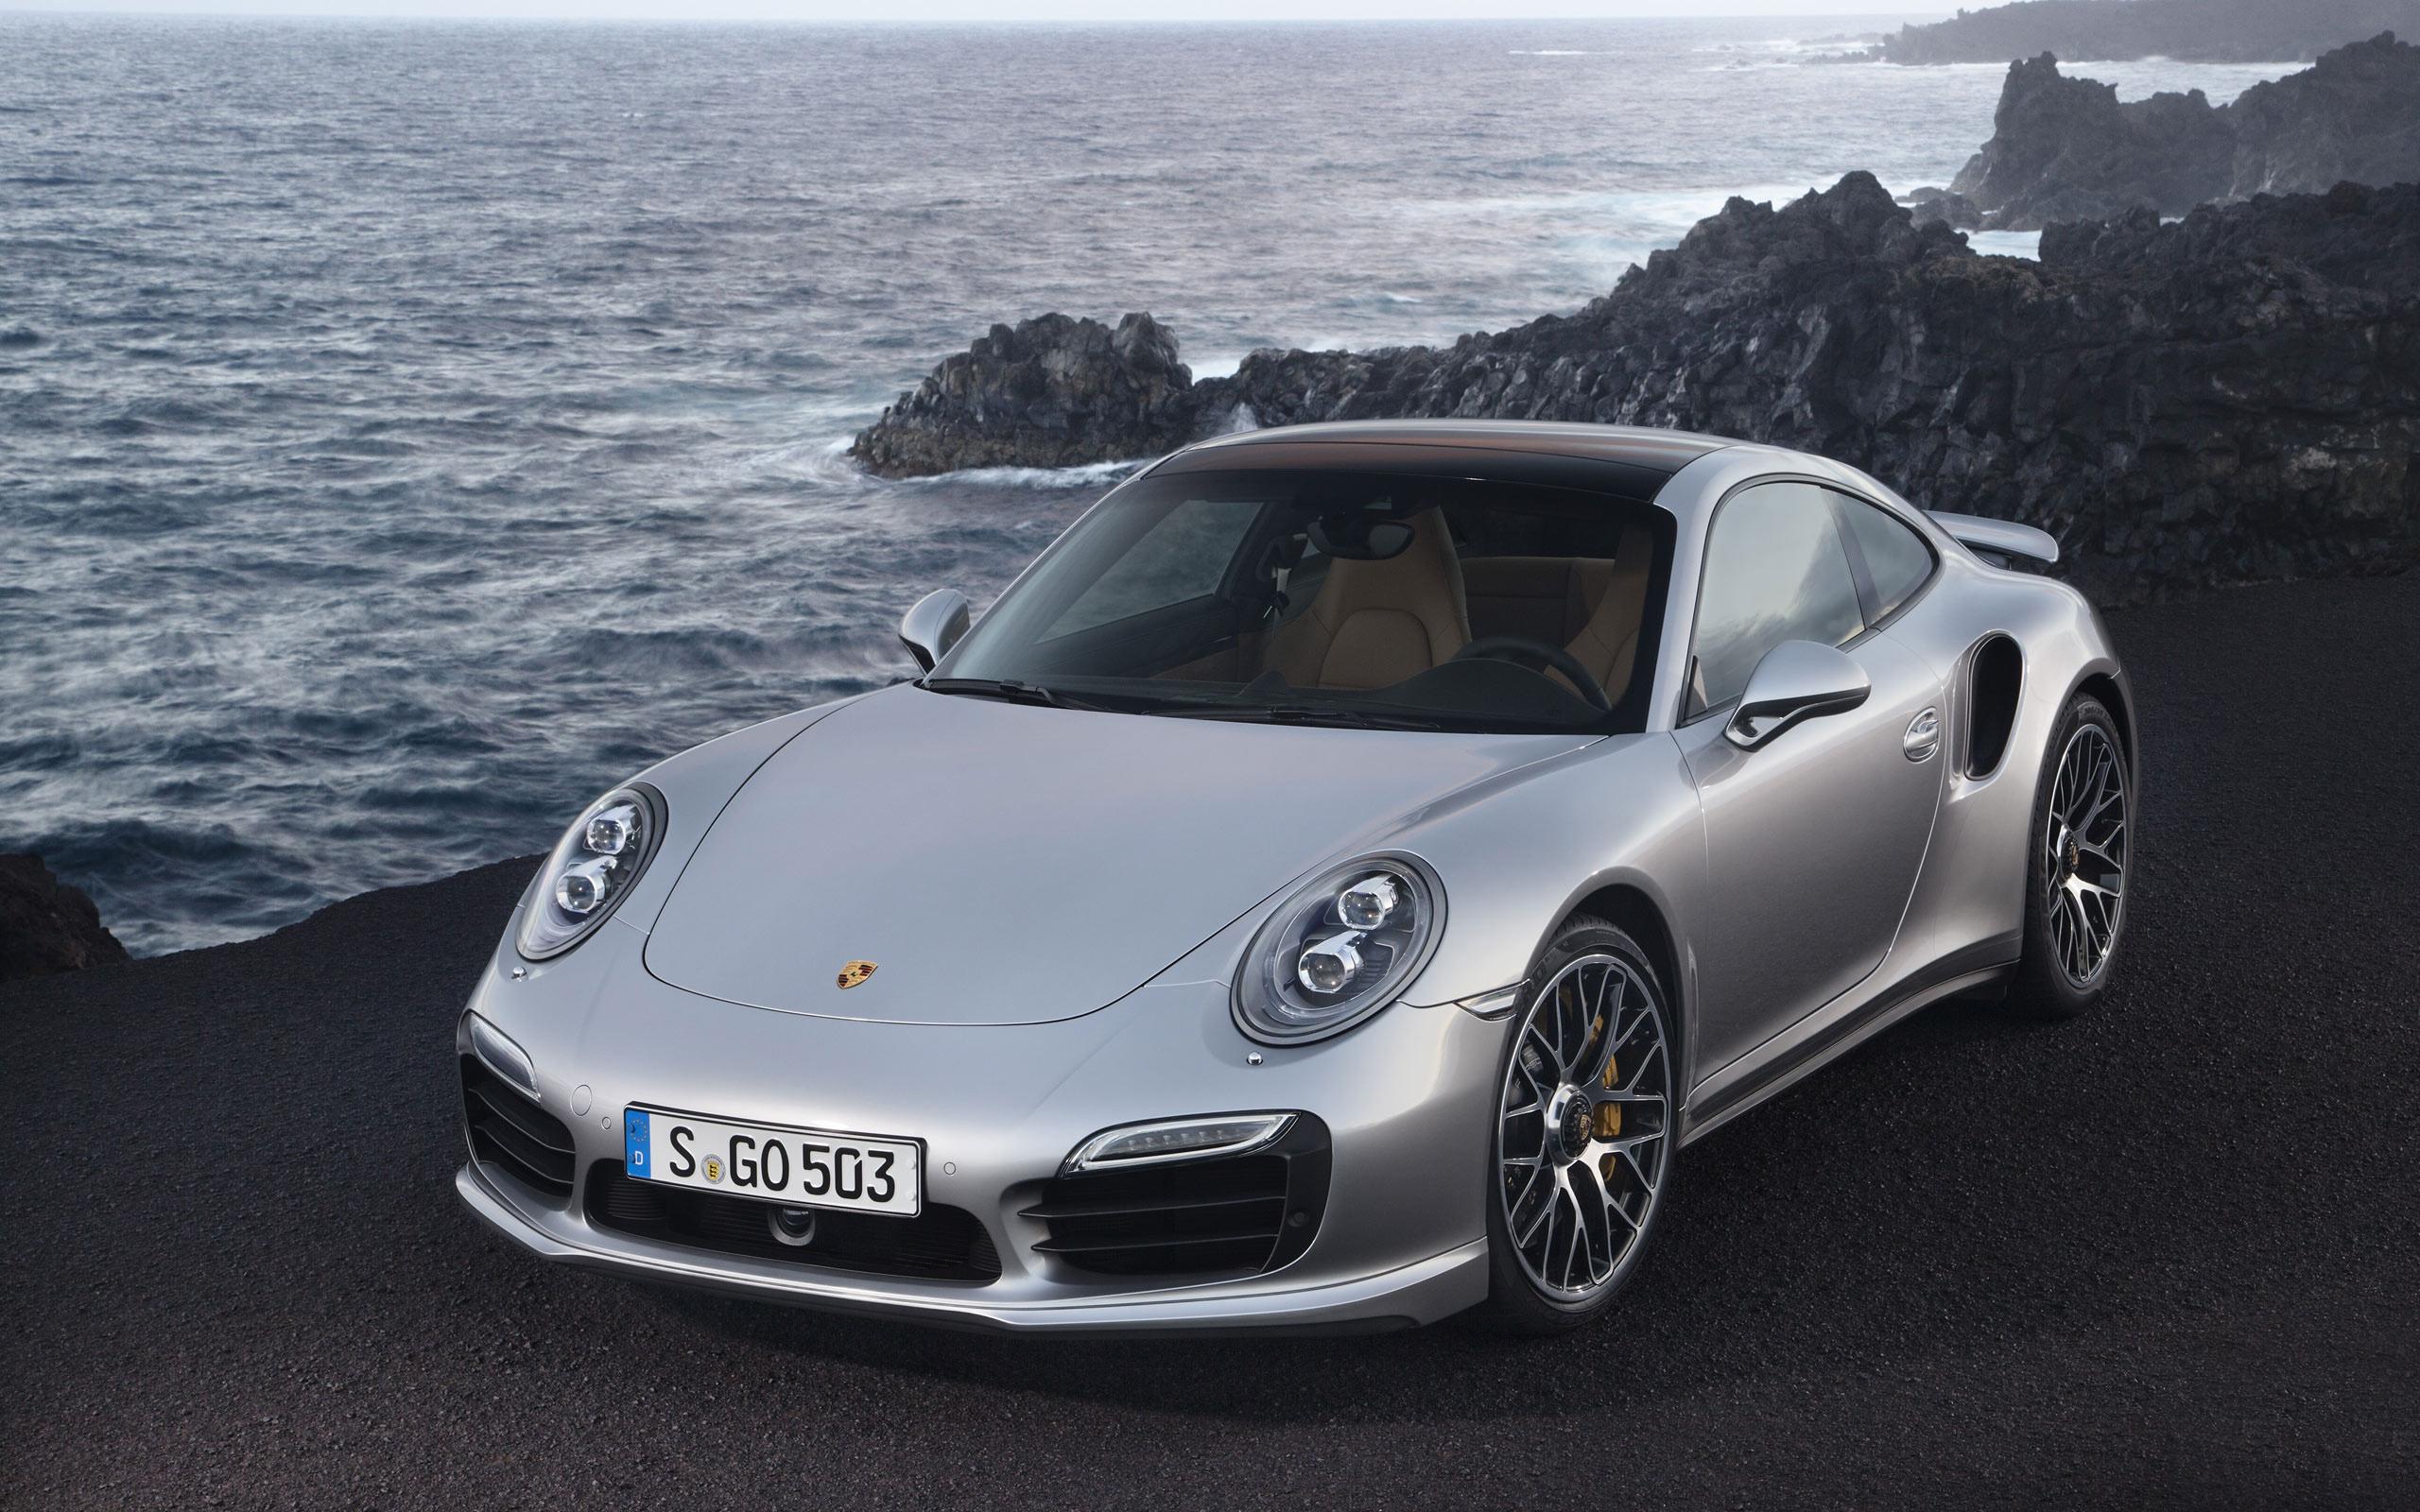 wwwhdcarwallpaperscom2014 porsche 911 turbo s wallpapershtml 2560x1600